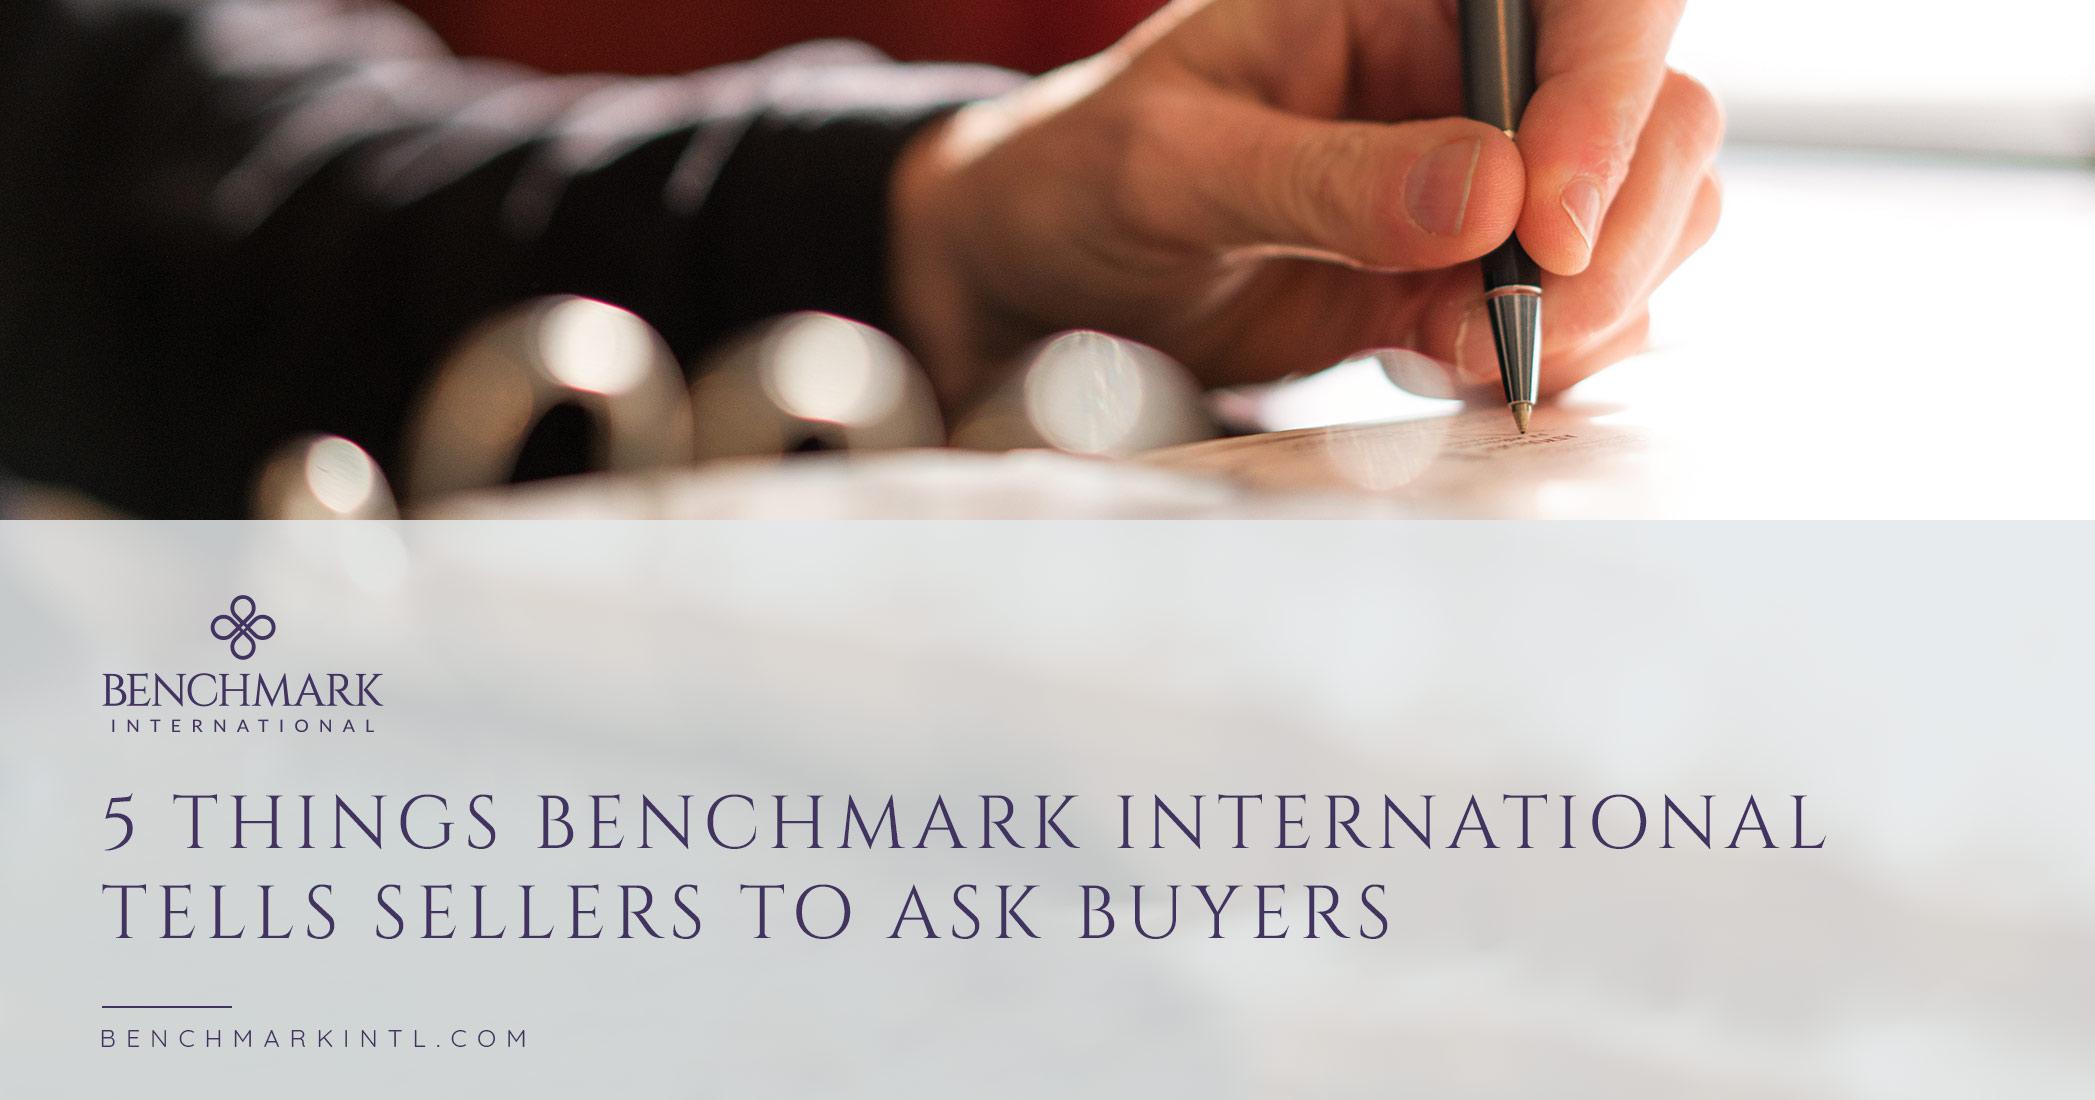 5 Things Benchmark International Tells Sellers to Ask Buyers